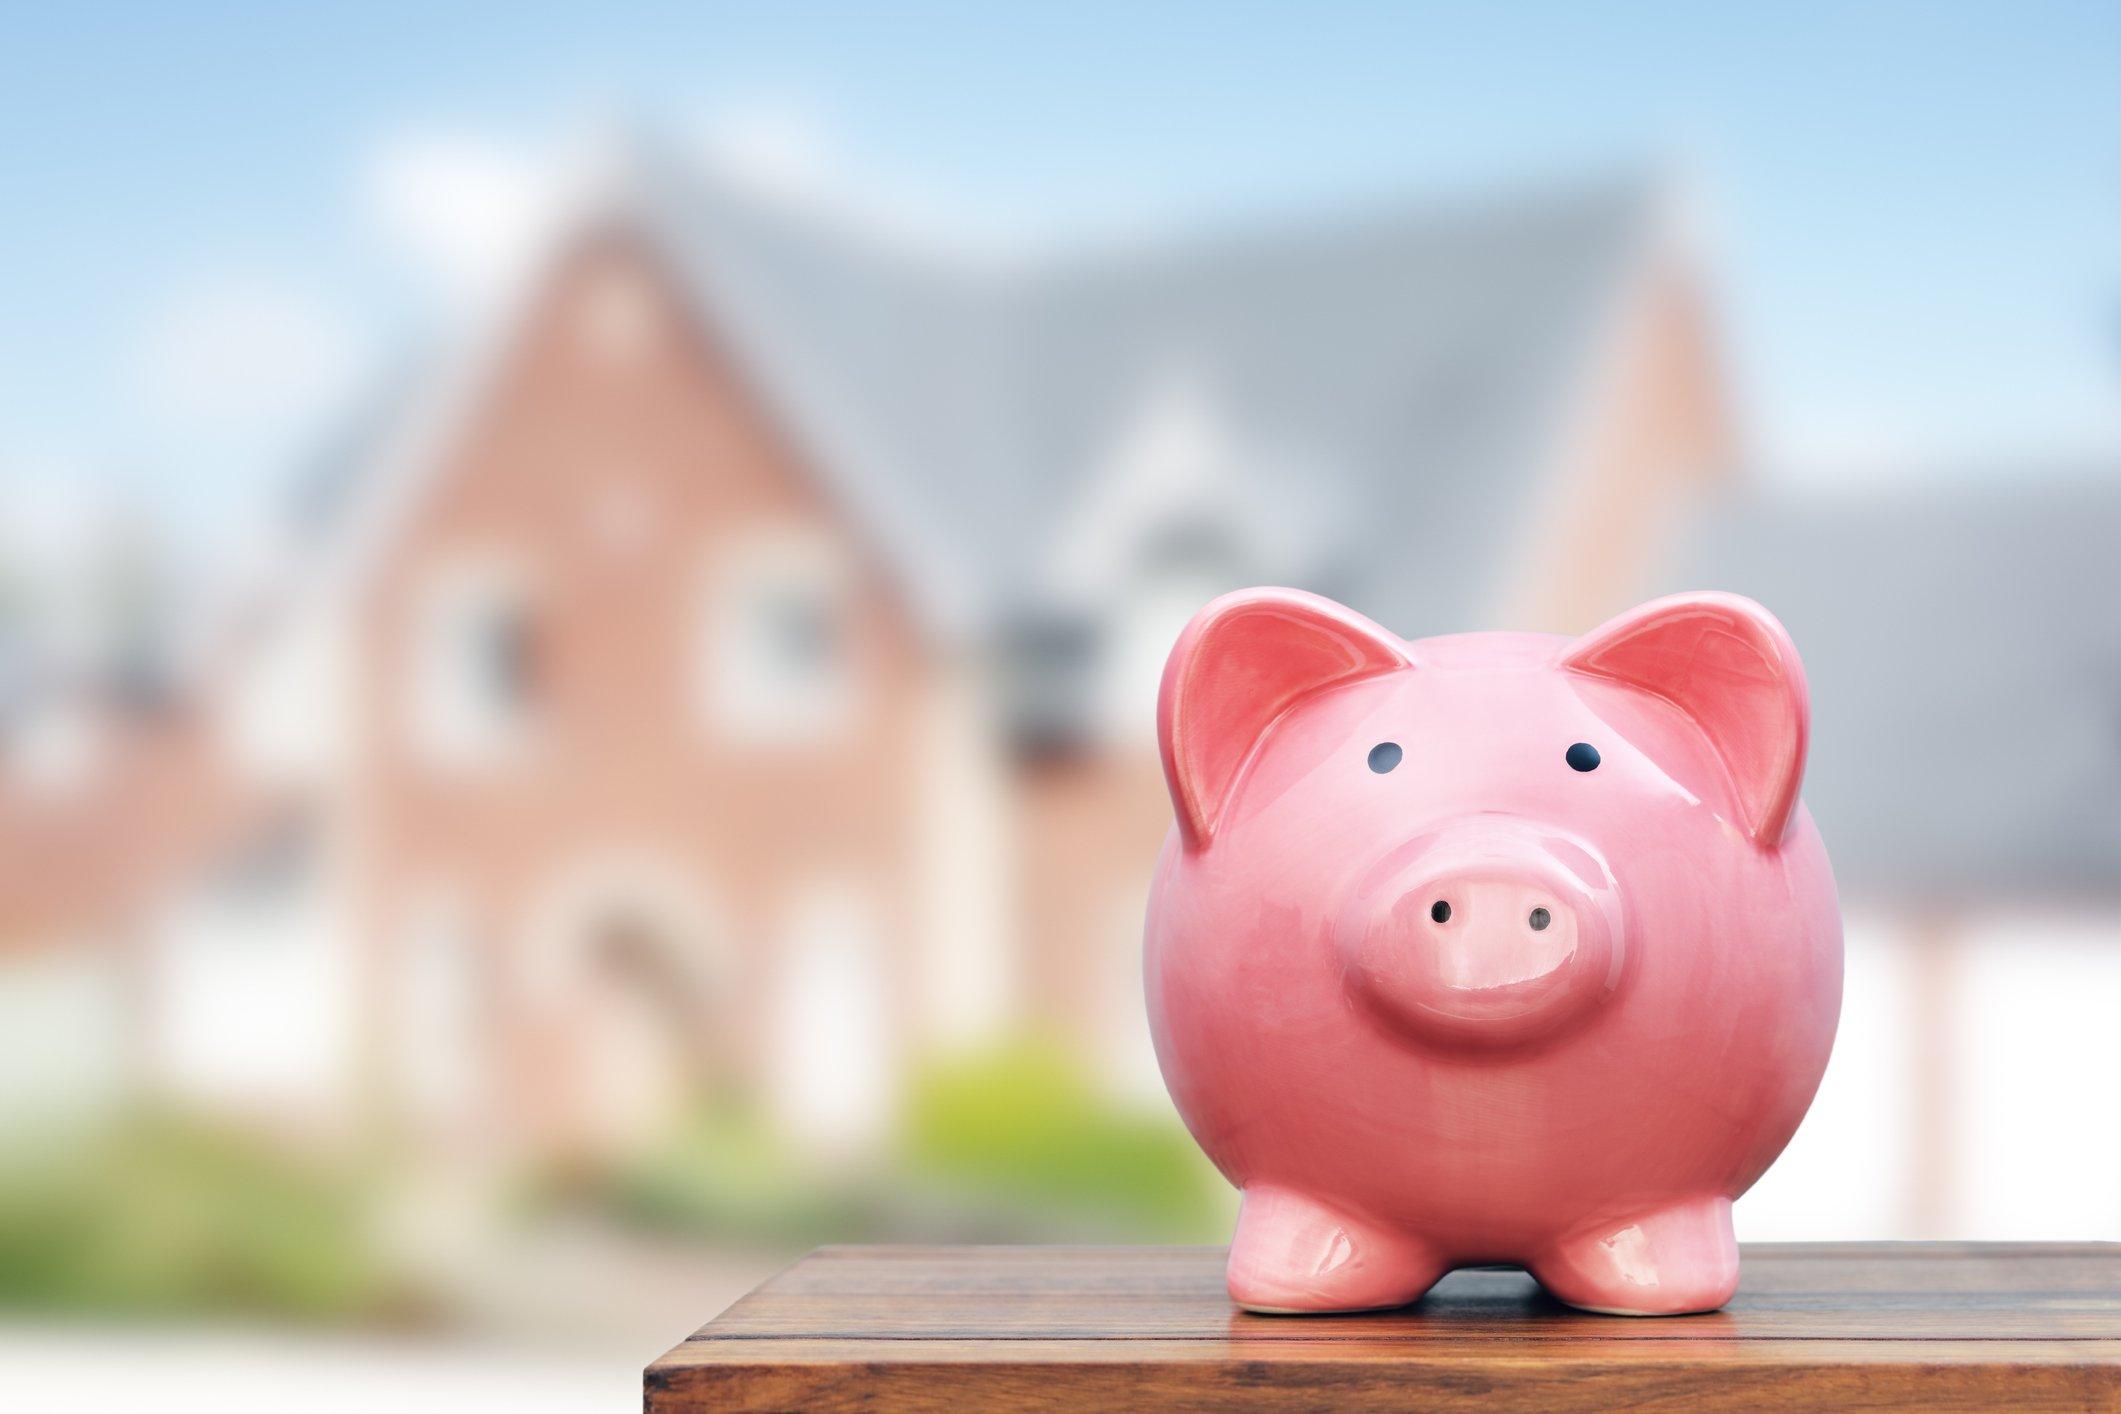 refinansiere-boliglån